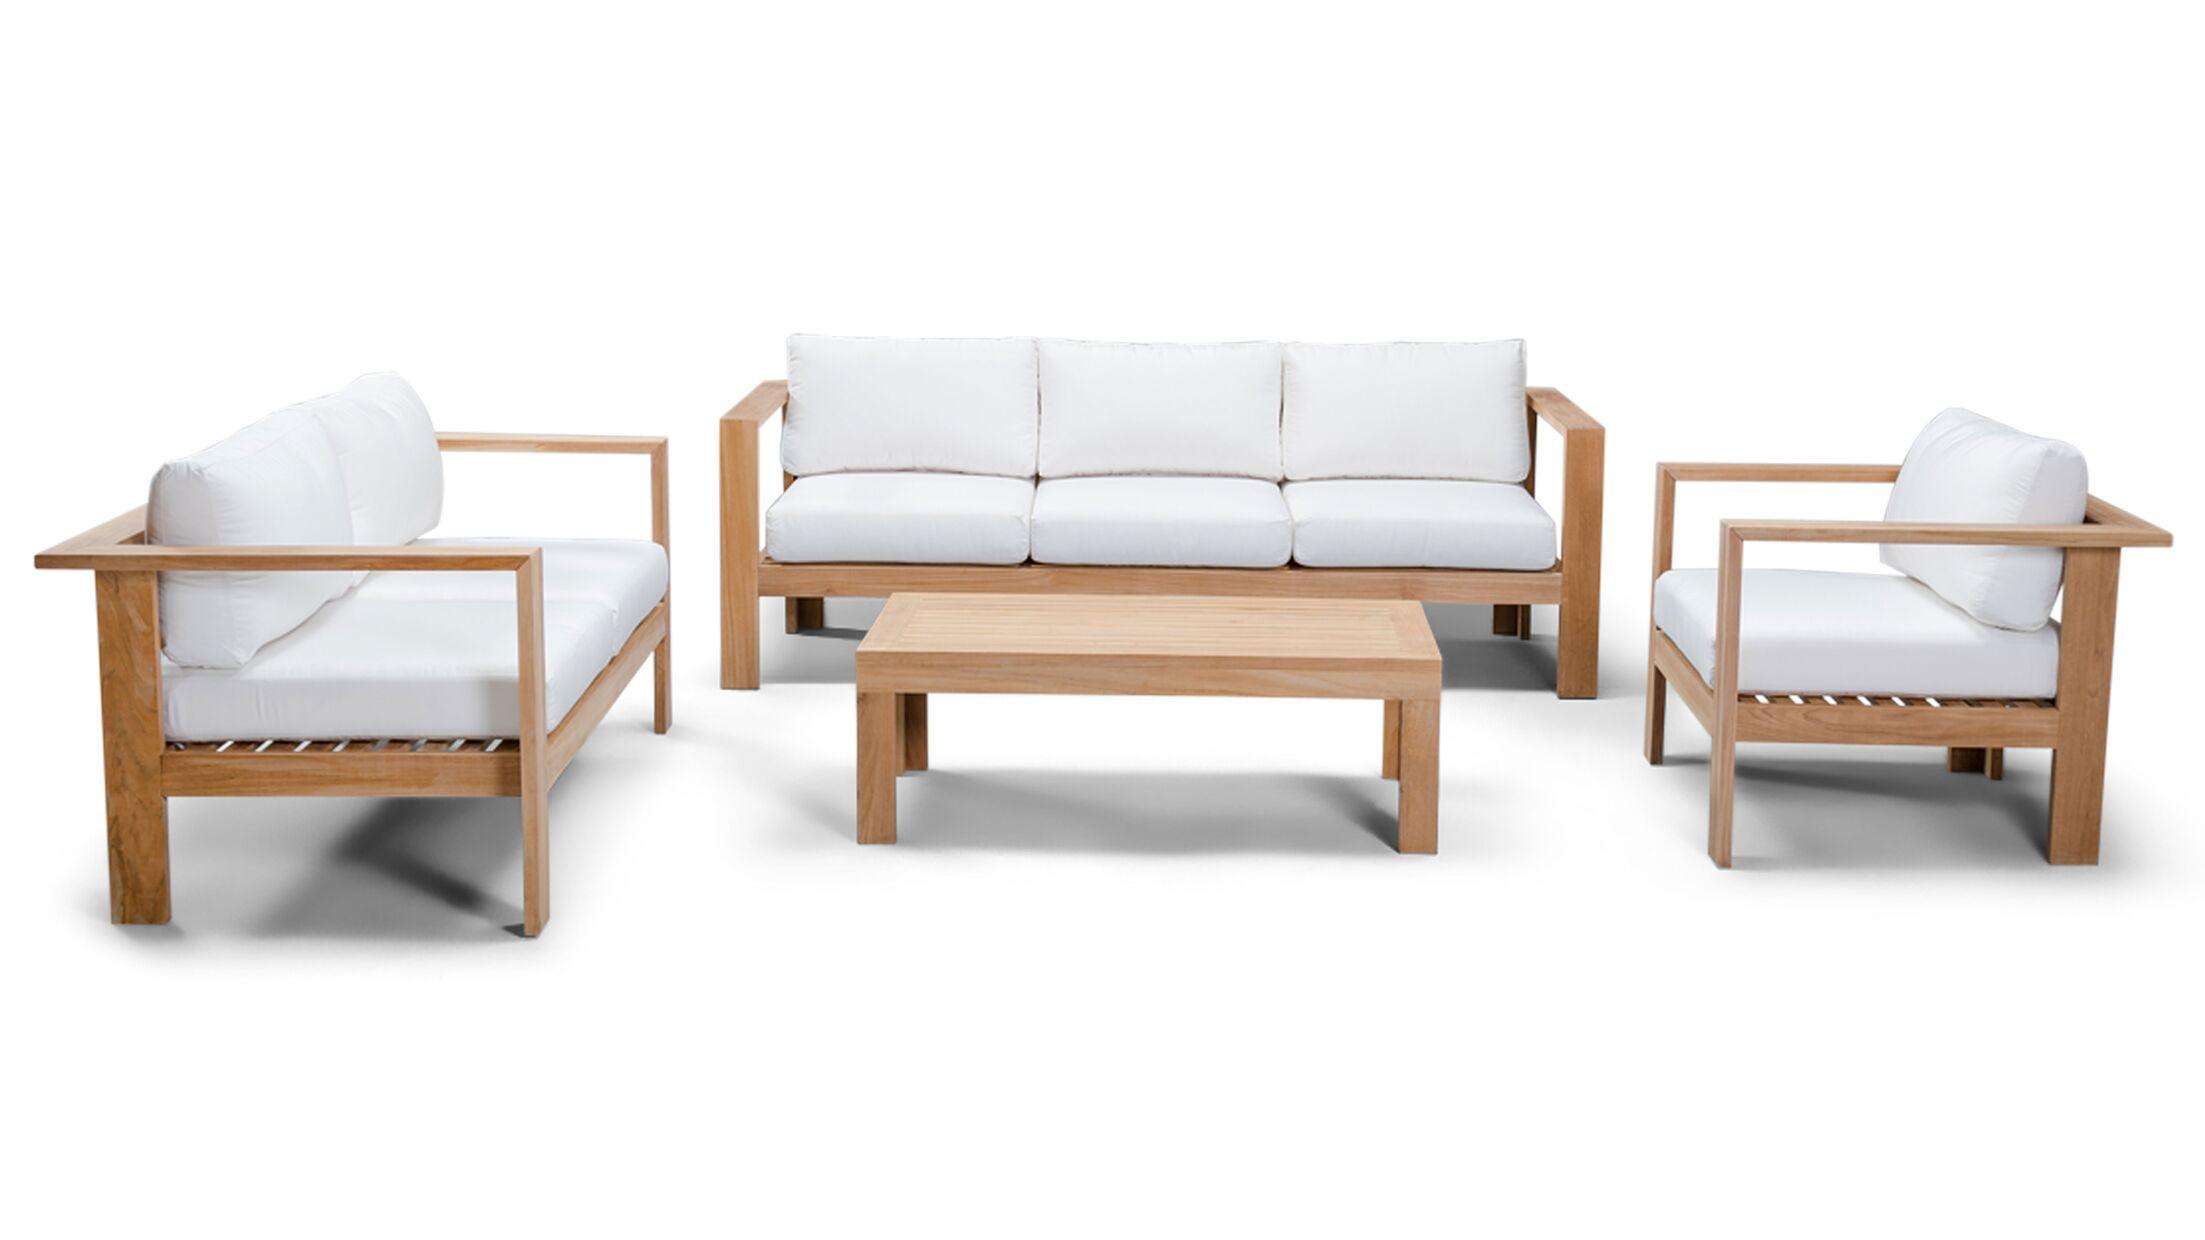 Ando 4 Piece Teak Sunbrella Sofa Set with Cushions Fabric: Canvas Natural